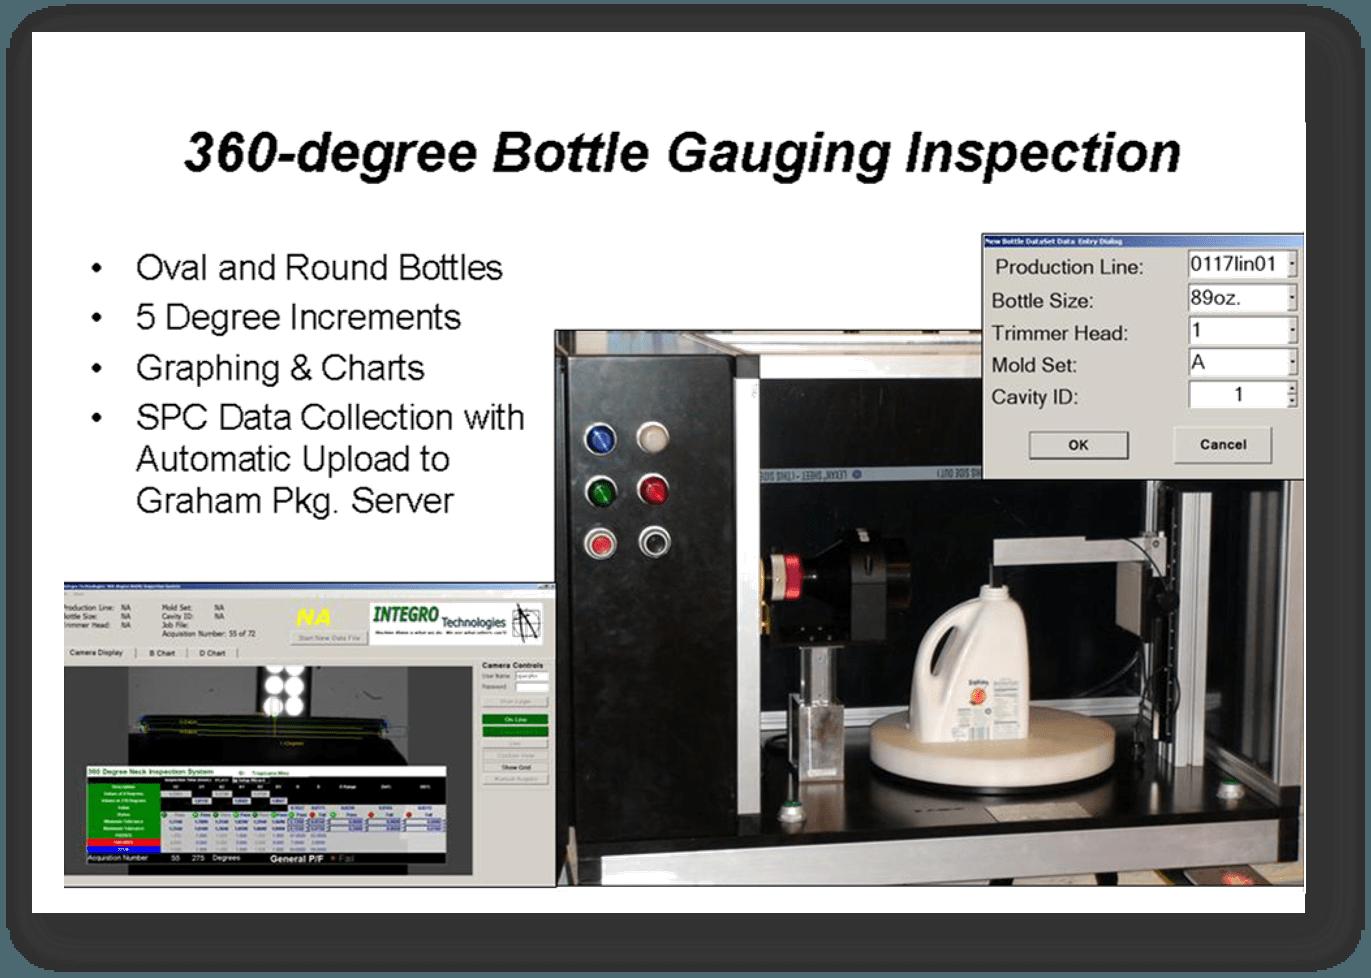 360 Degree Bottle Gauging Inspection